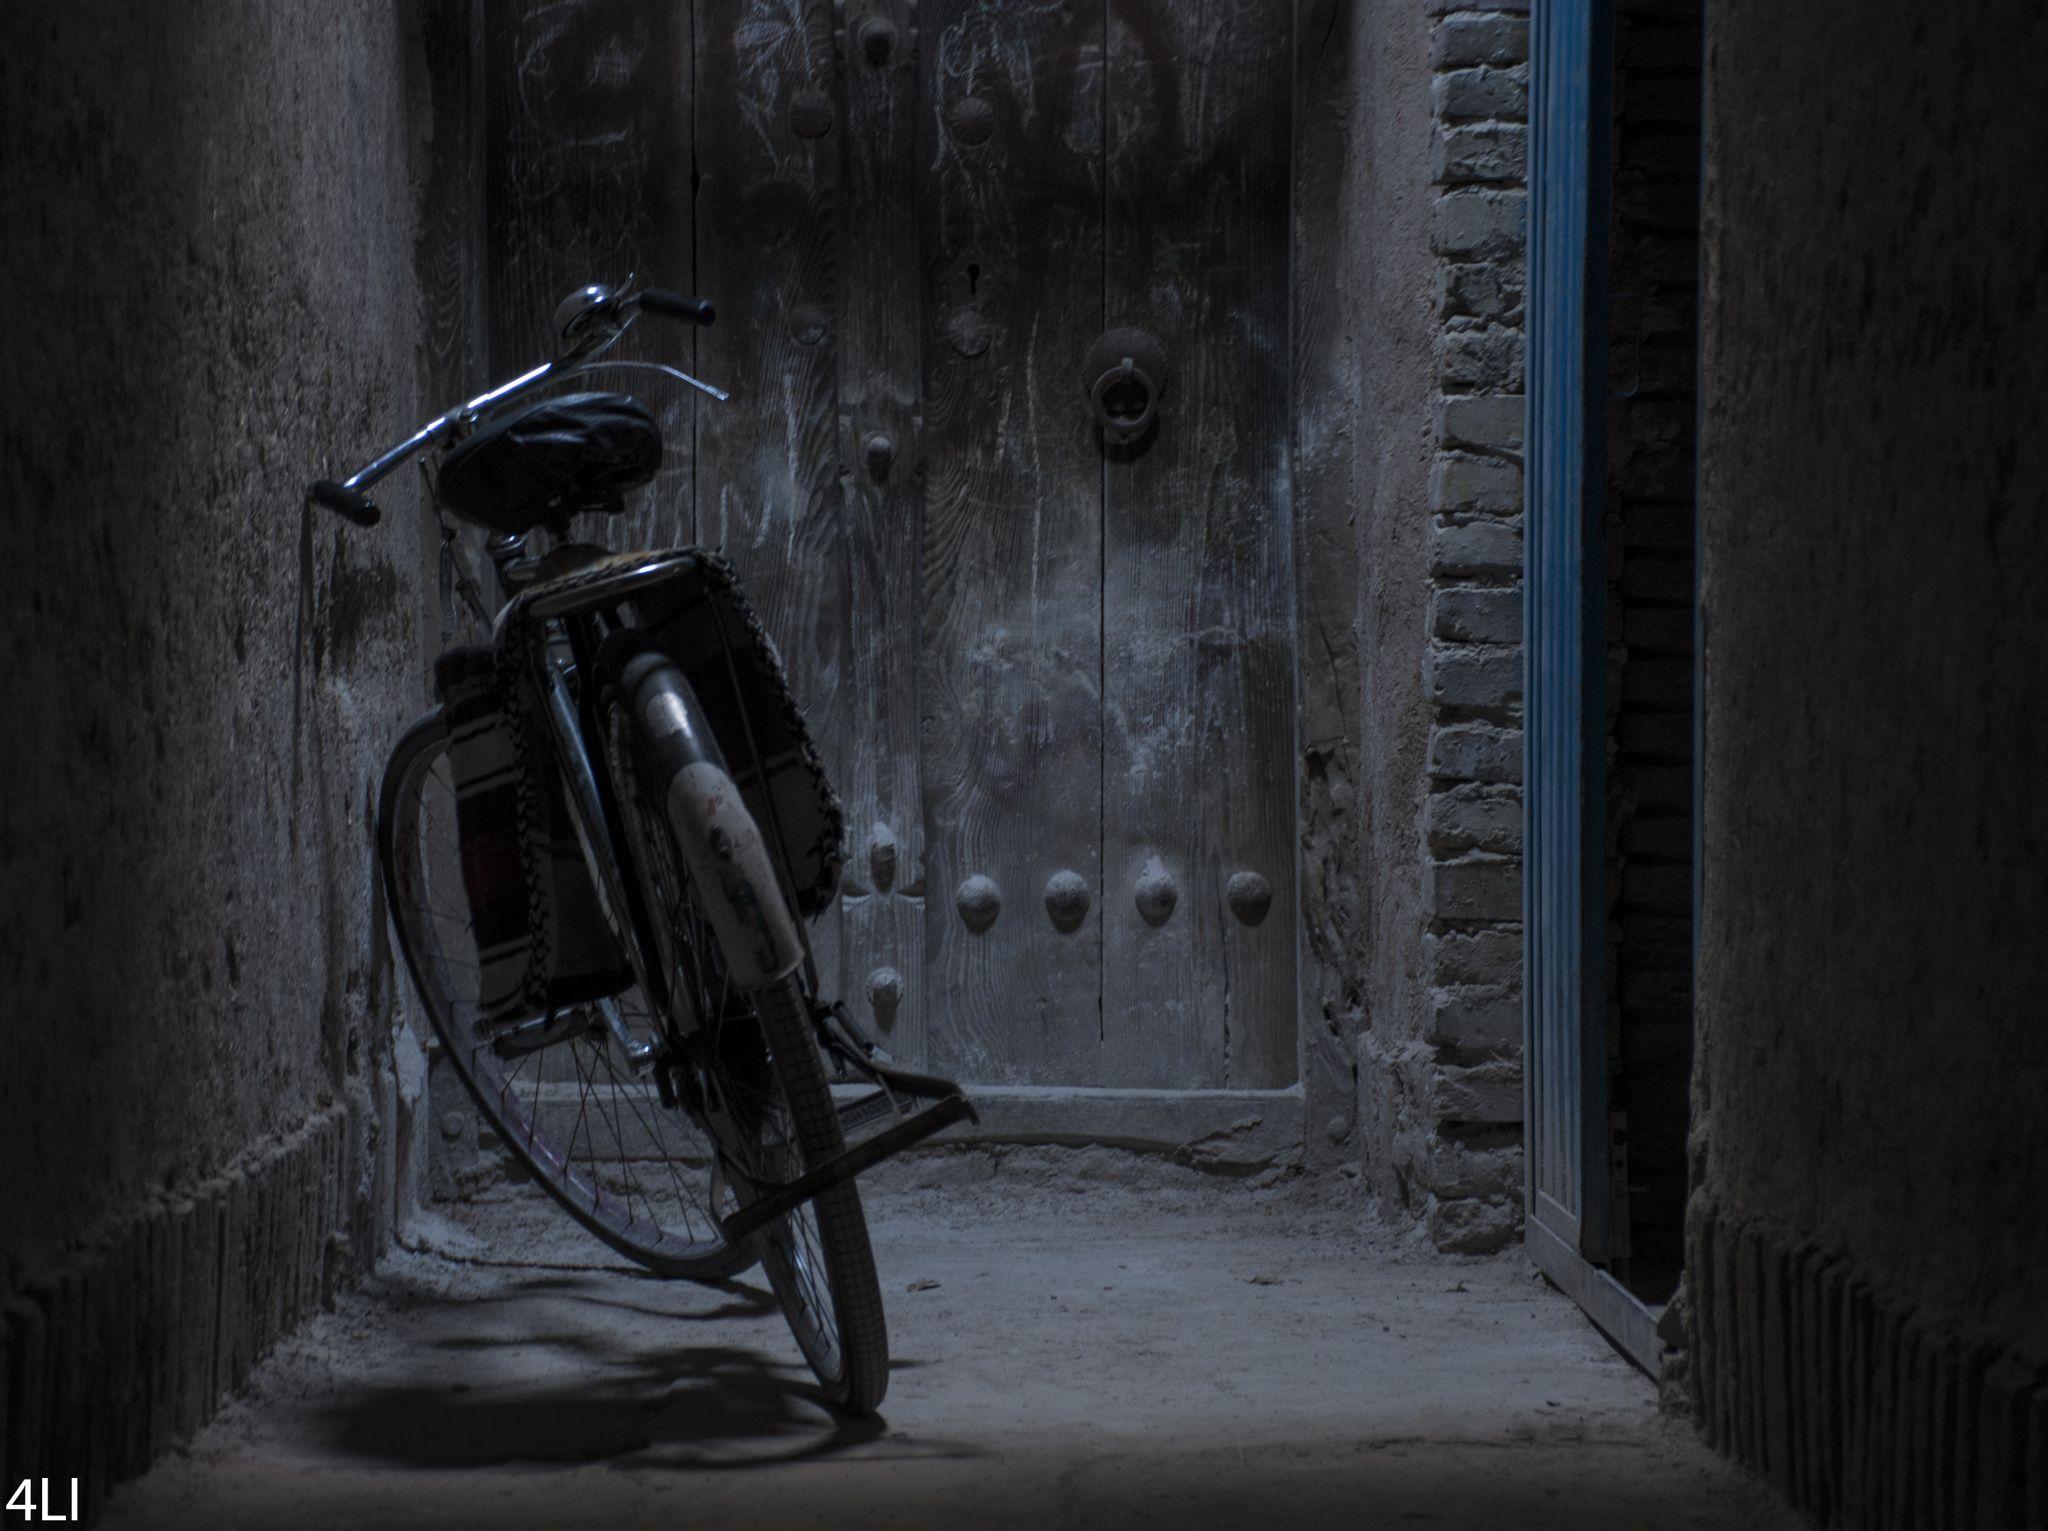 #Iran by Ali karimizade on 500px